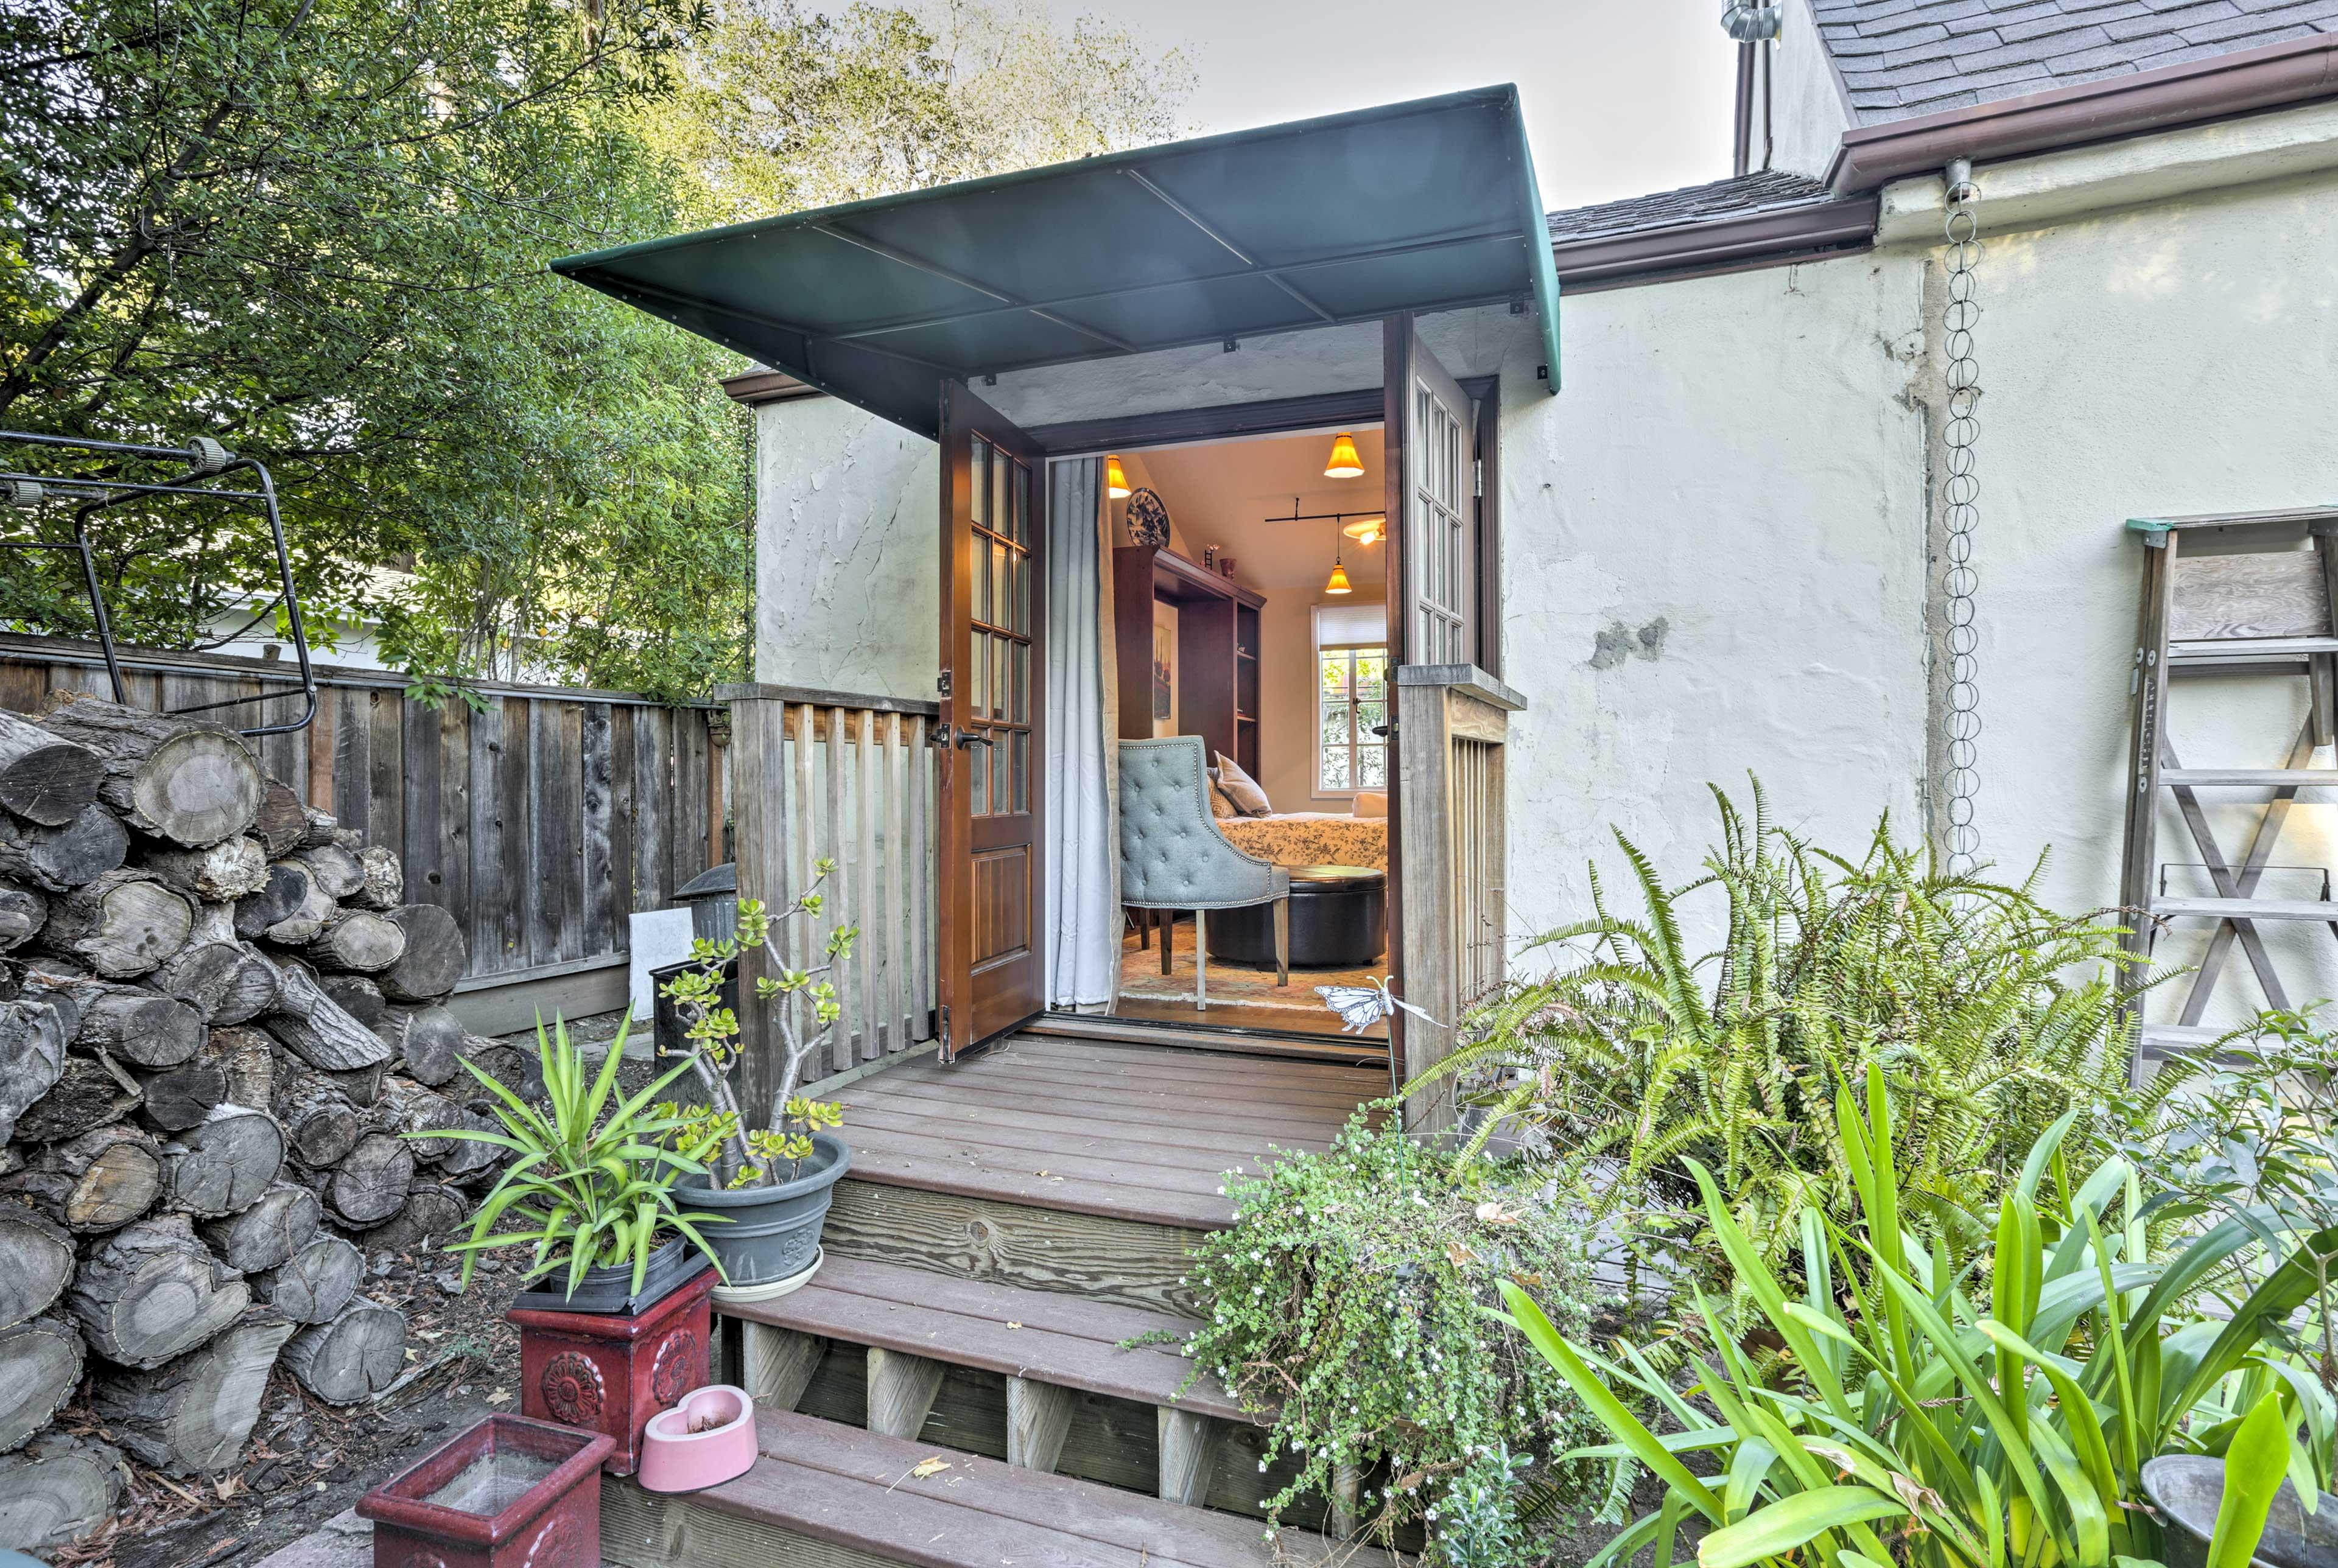 Enjoy the direct garden access from both entrances of the home.